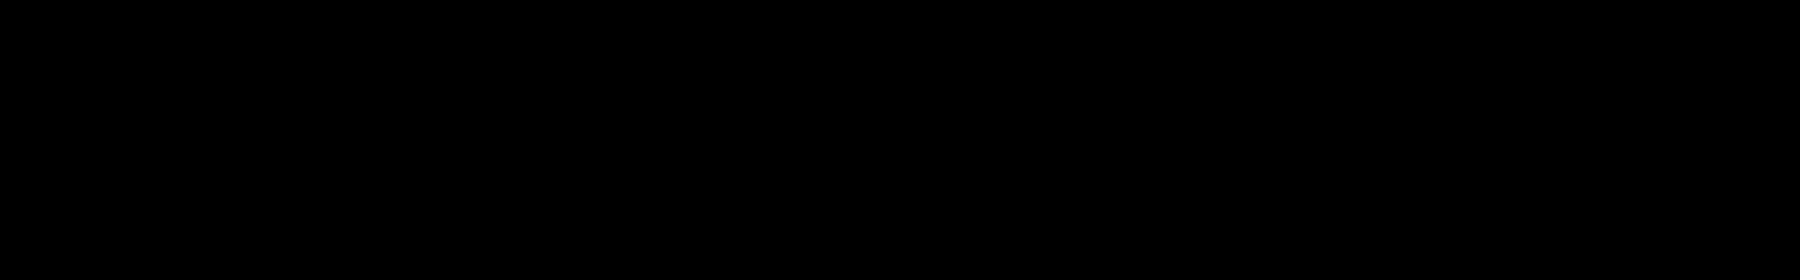 A.N.A. FX Risers audio waveform